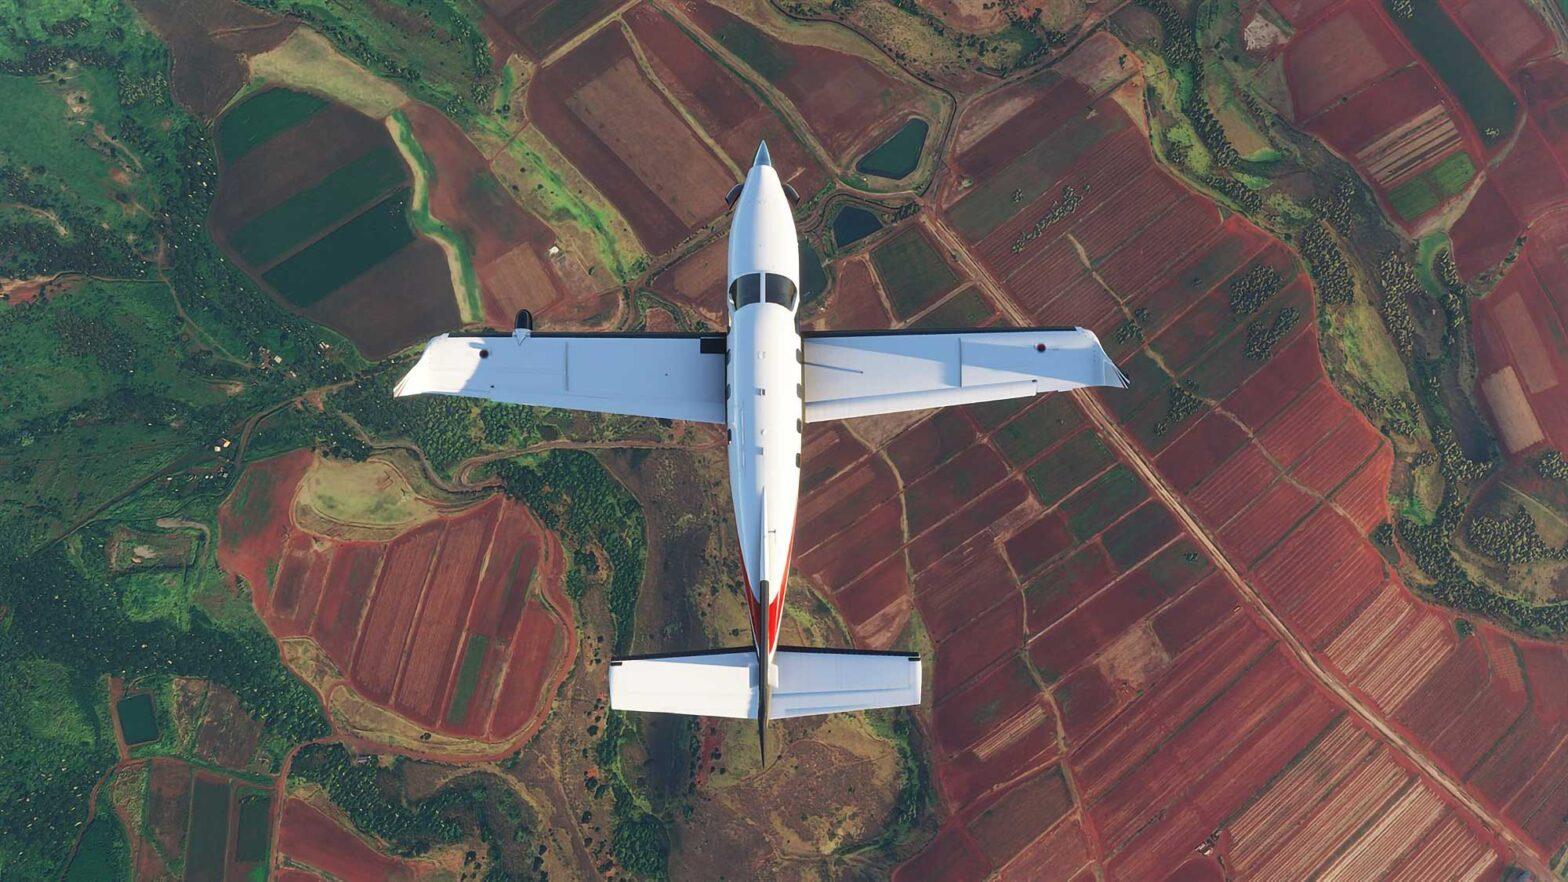 Microsoft Flight Simulator 2020 Video Game